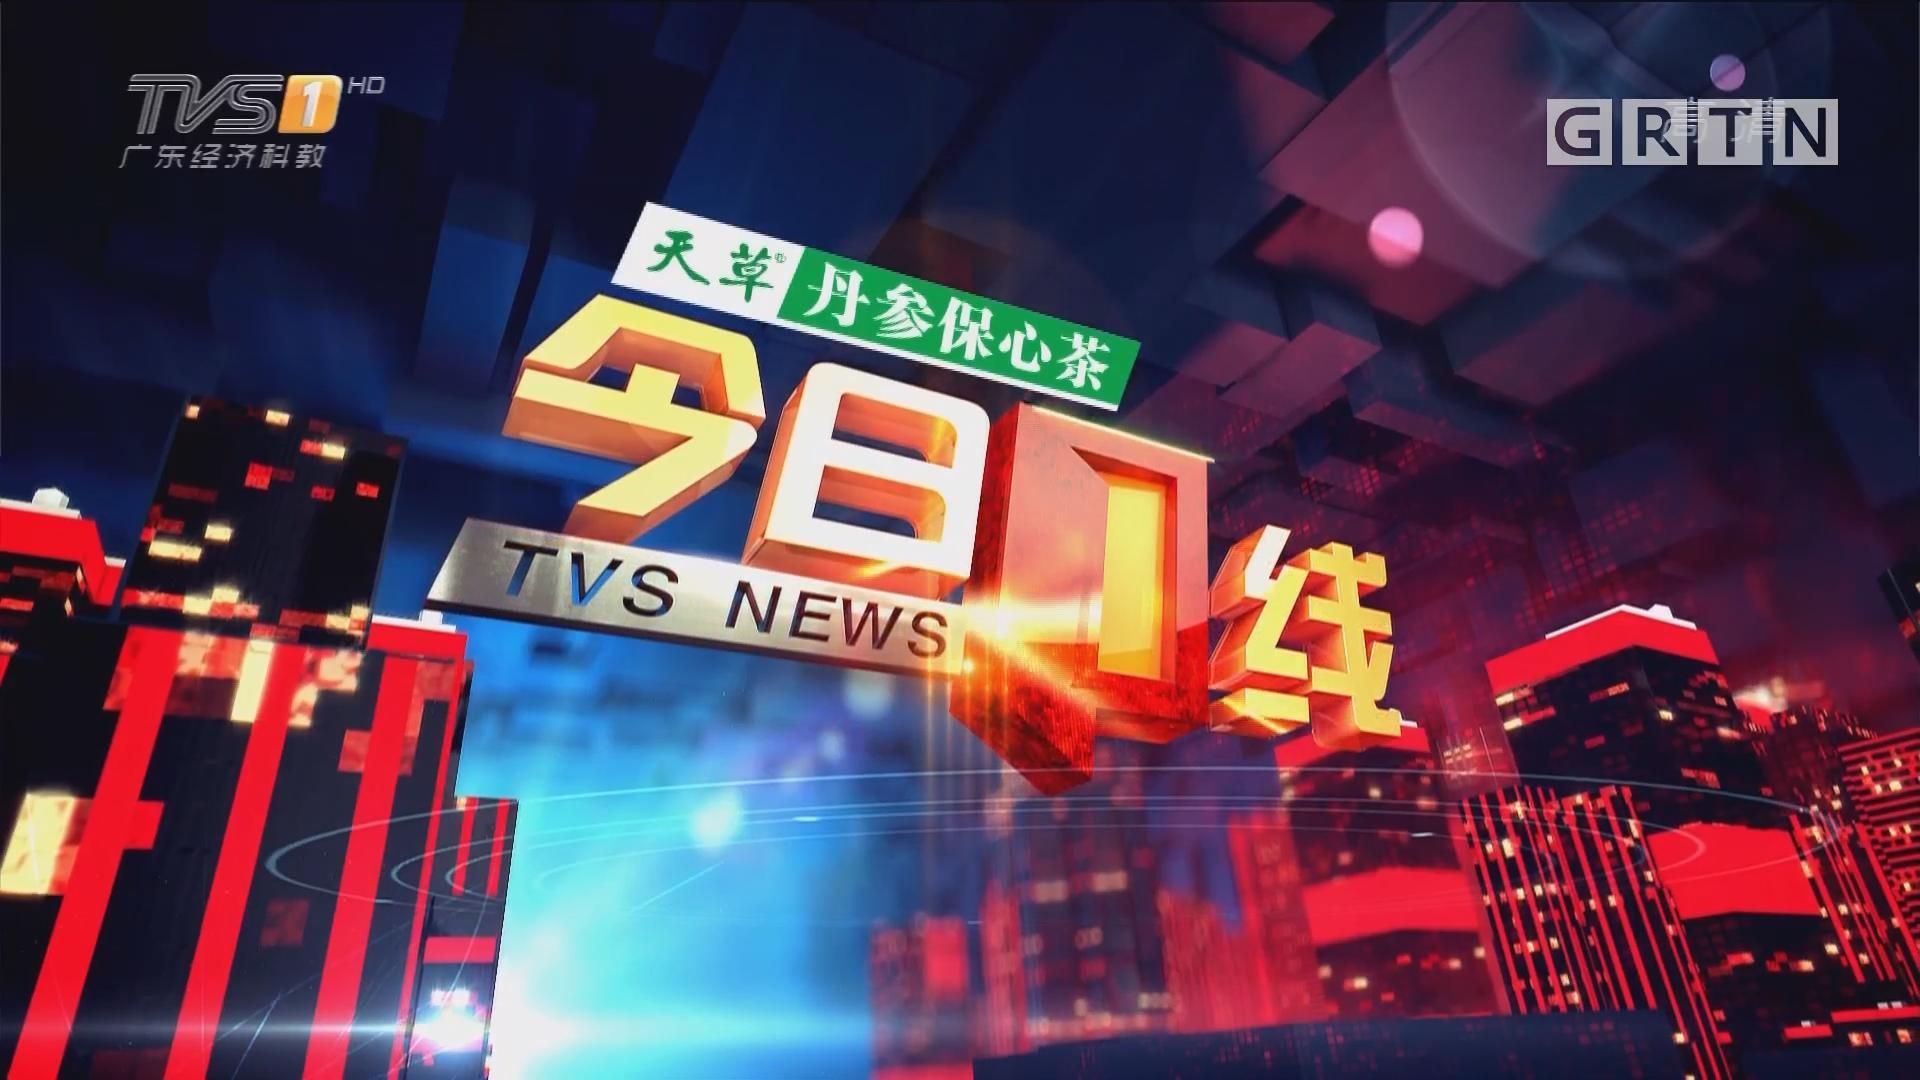 [HD][2018-02-19]今日一线:珠海南屏收费站:百元大钞散落高速 谁撒的钱?